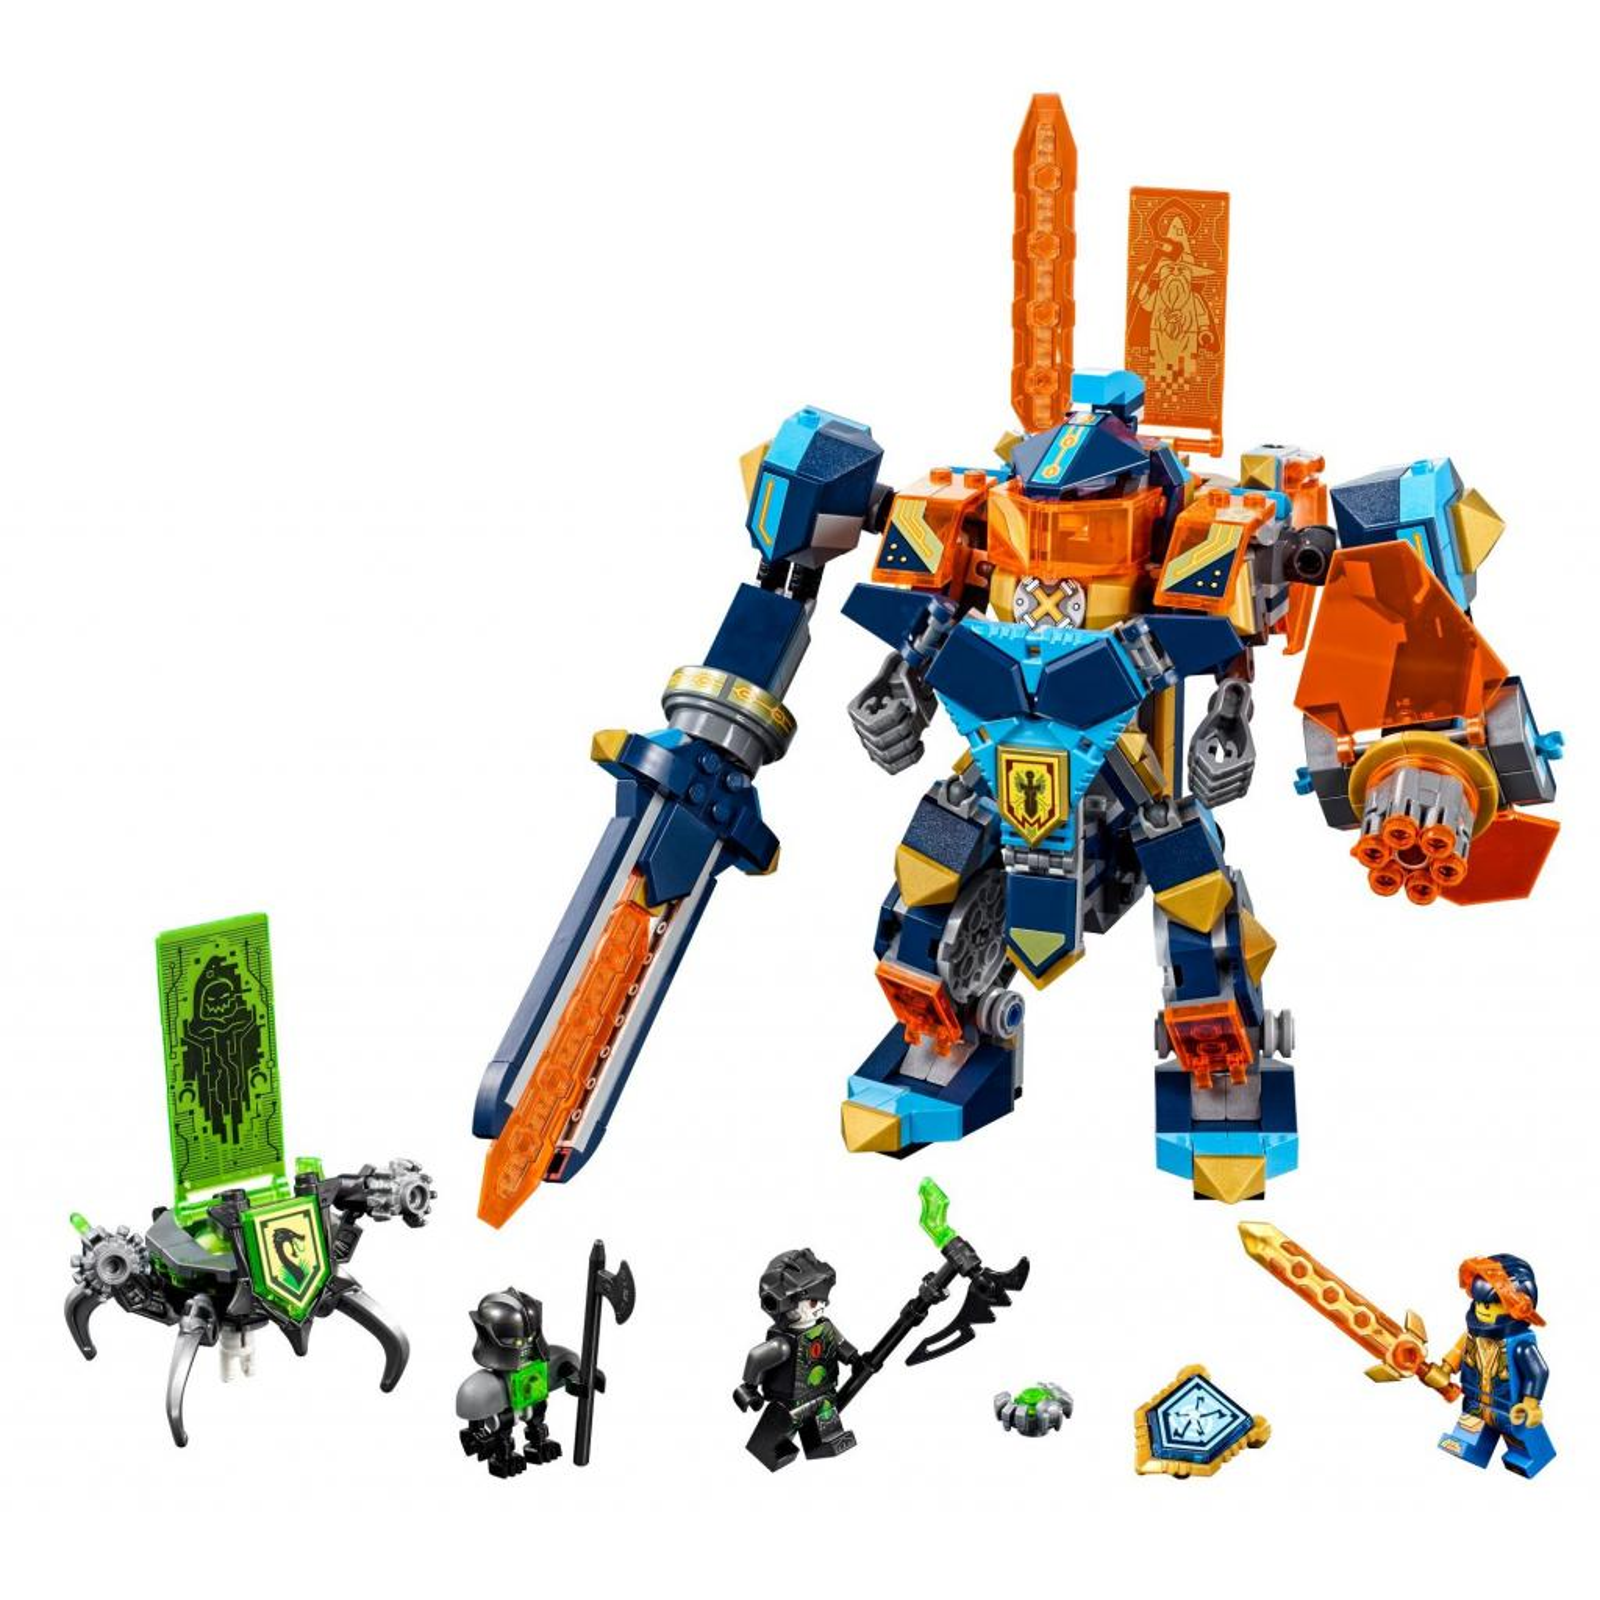 Конструктор LEGO Nexo Knights Бой техномагов (72004) изображение 2